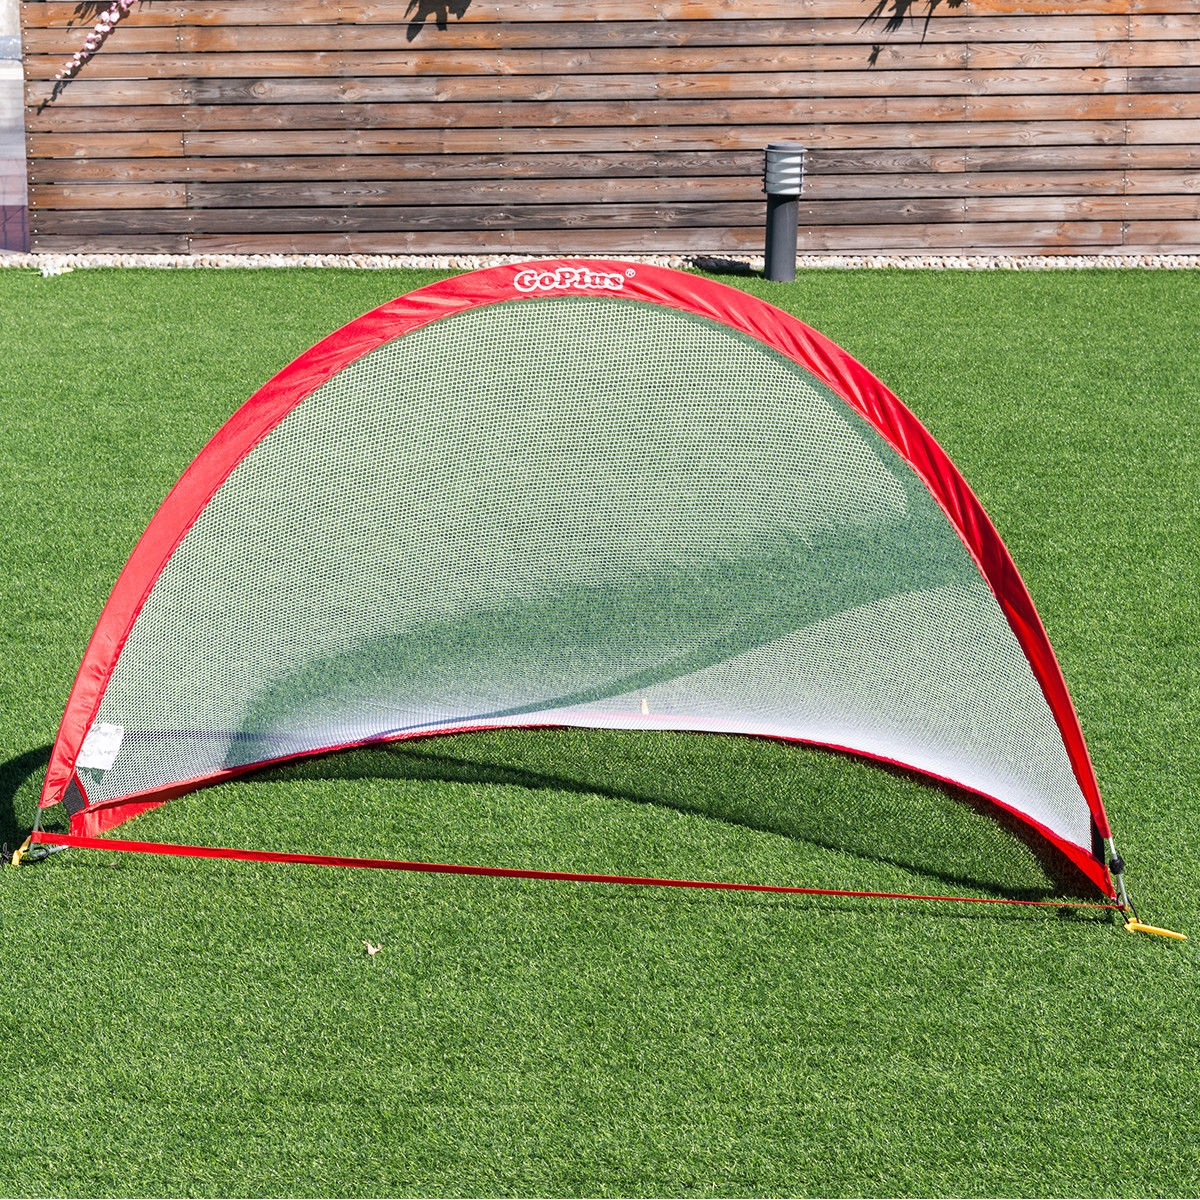 Set of 2 Portable 6' Pop-up Soccer Goals Set w/ Carrying Bag